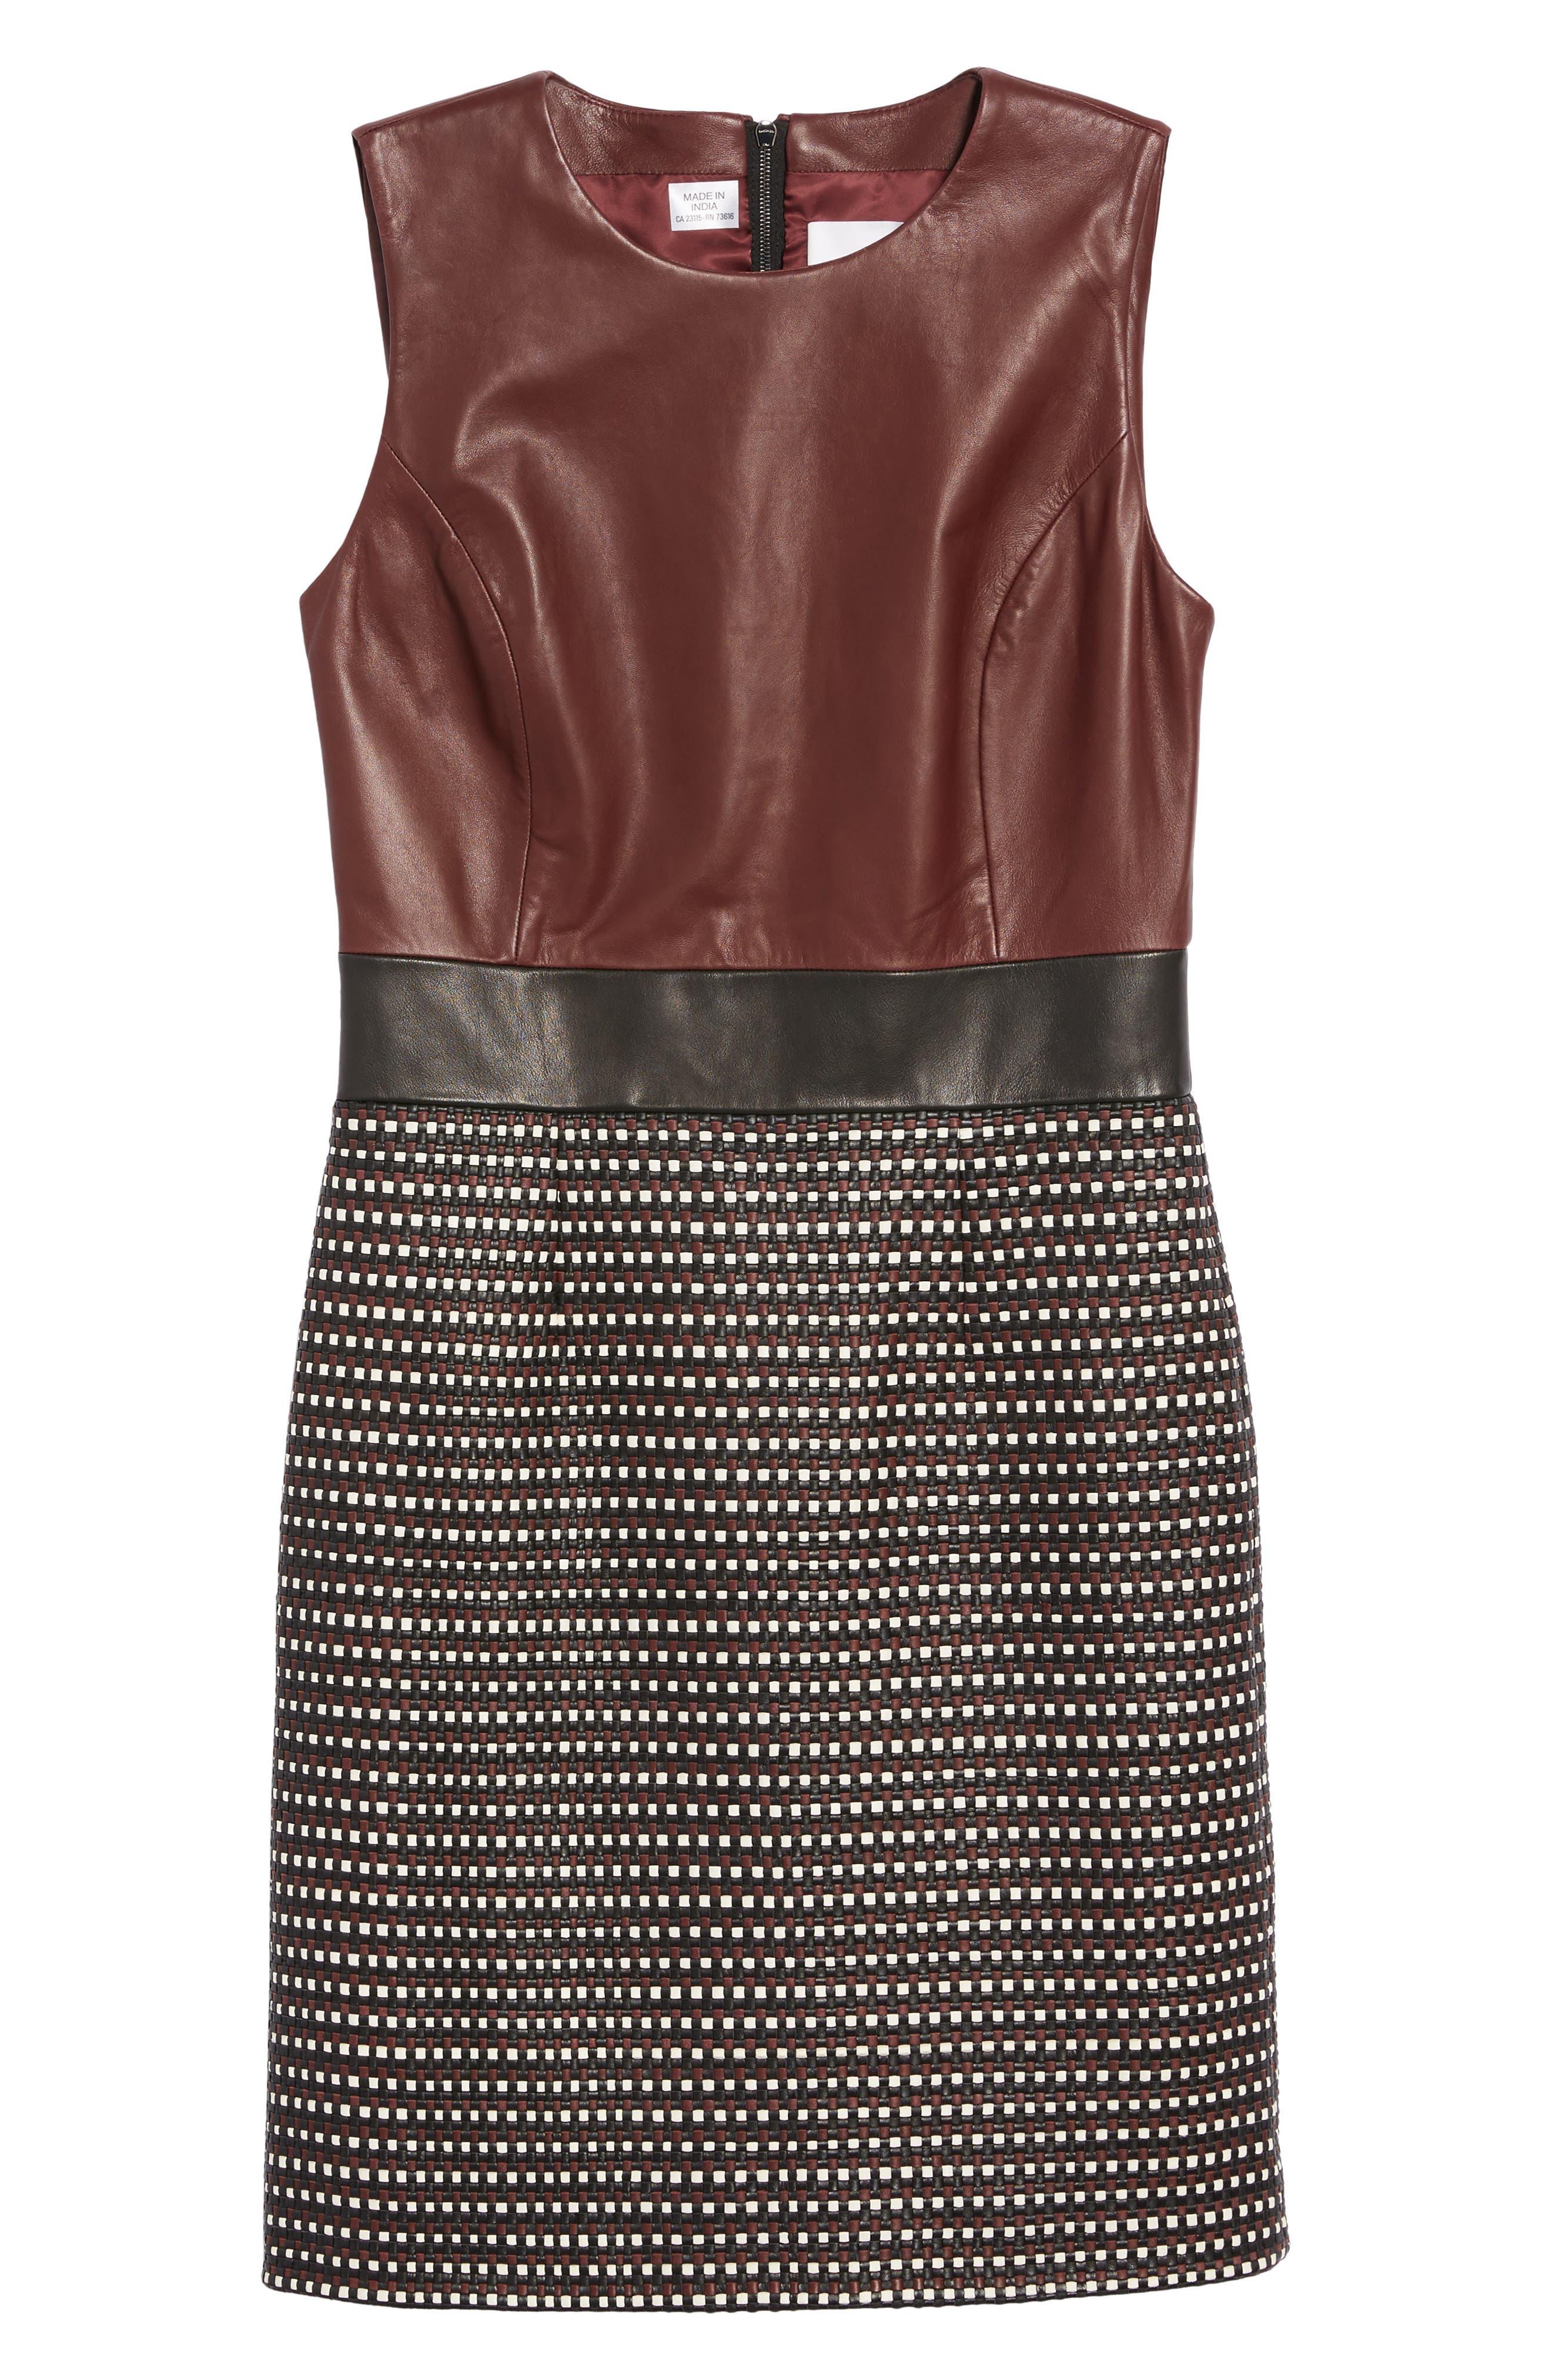 Syrina Leather Sheath Dress,                             Alternate thumbnail 6, color,                             Black/ Pomegranate